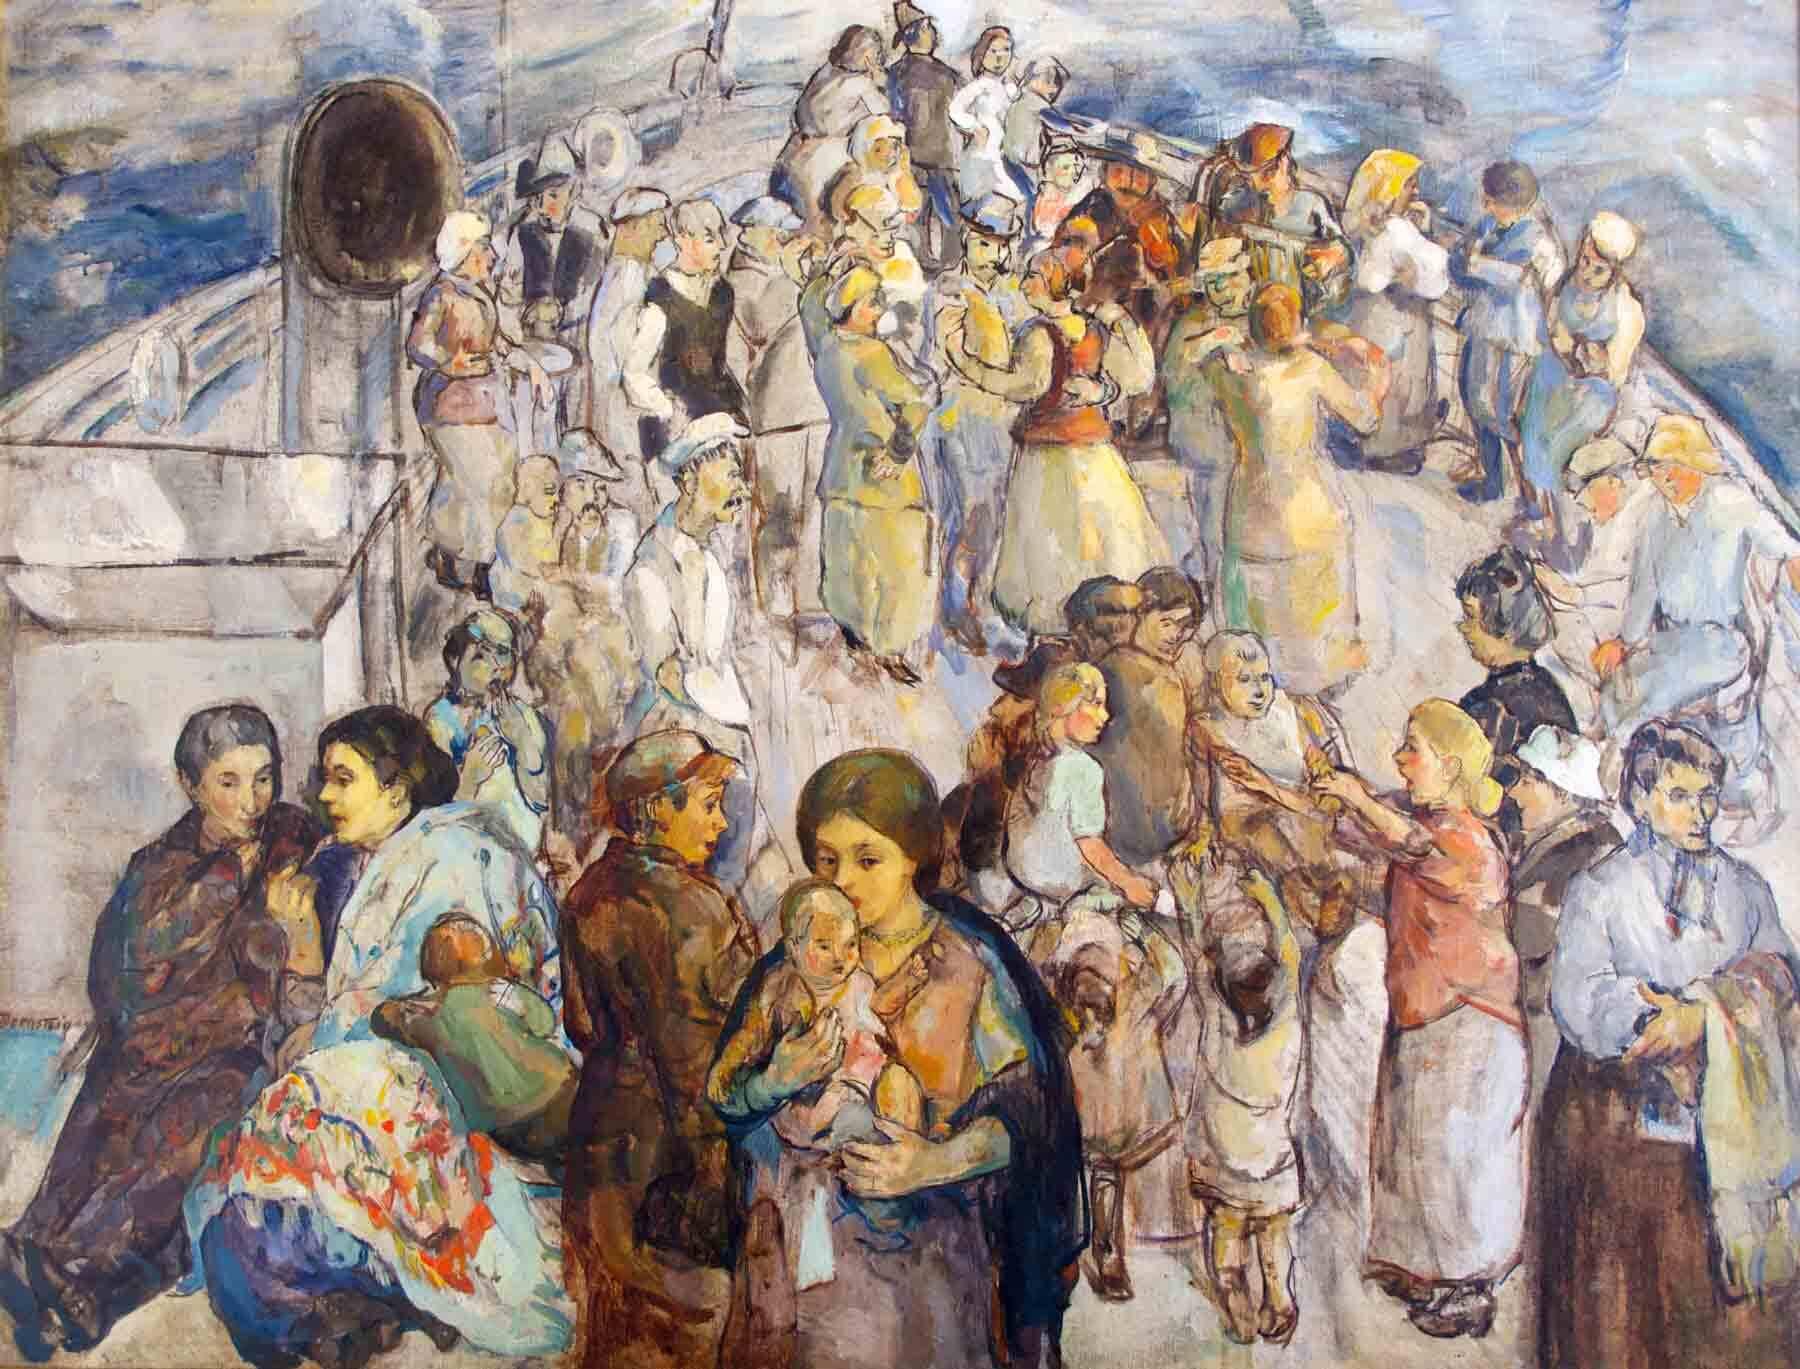 Theresa Bernstein (1890-2002). The Immigrants, 1923